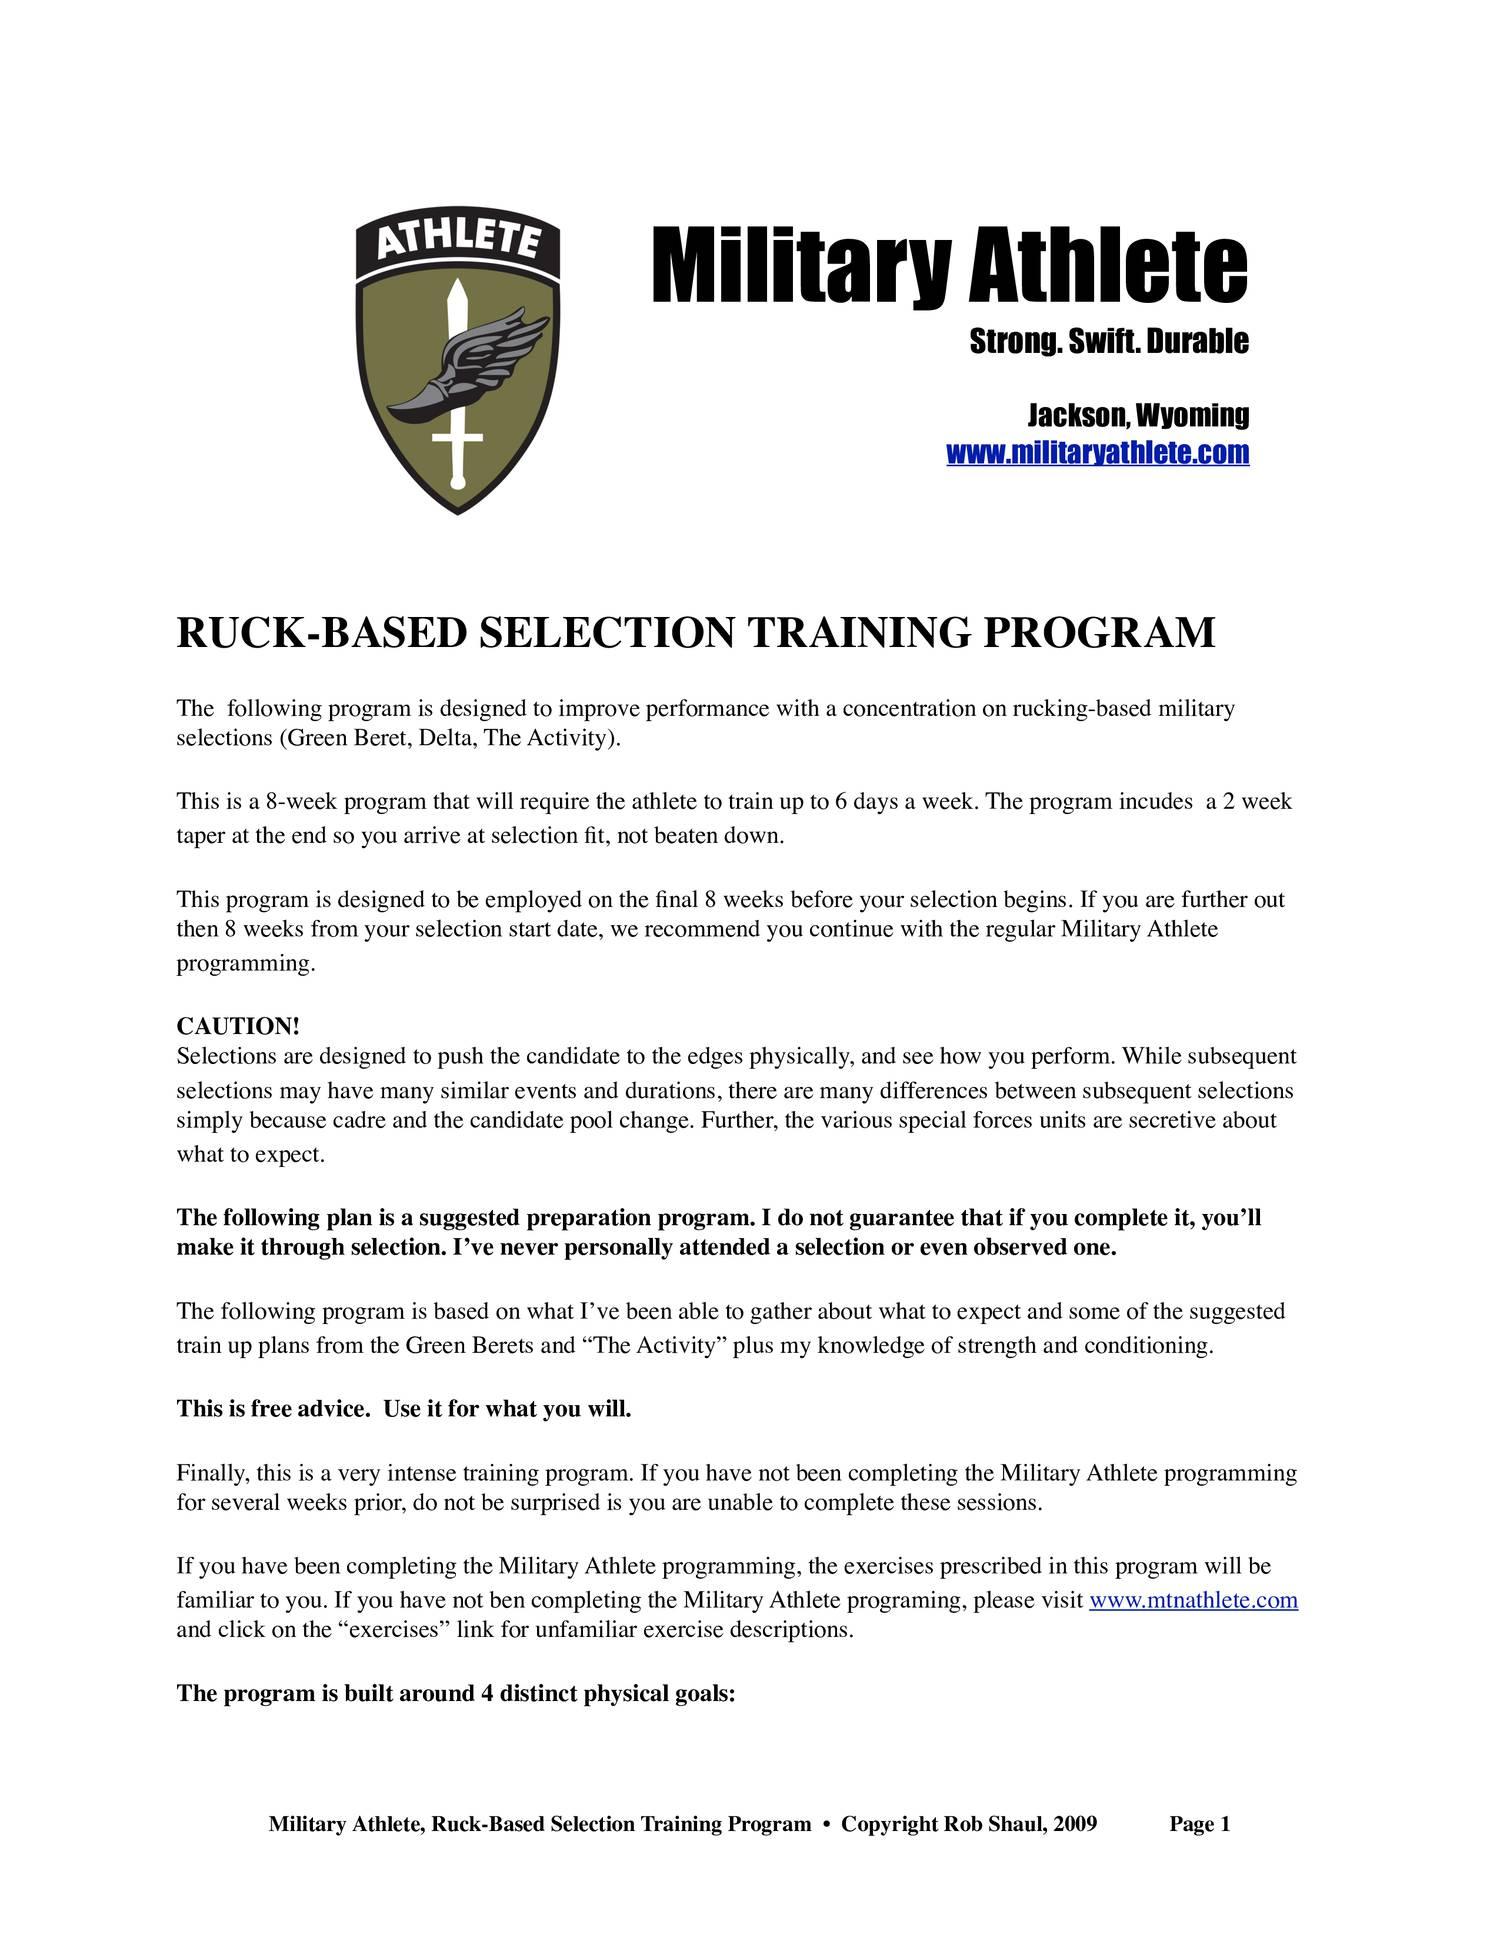 military athlete ruck based selection program pdf